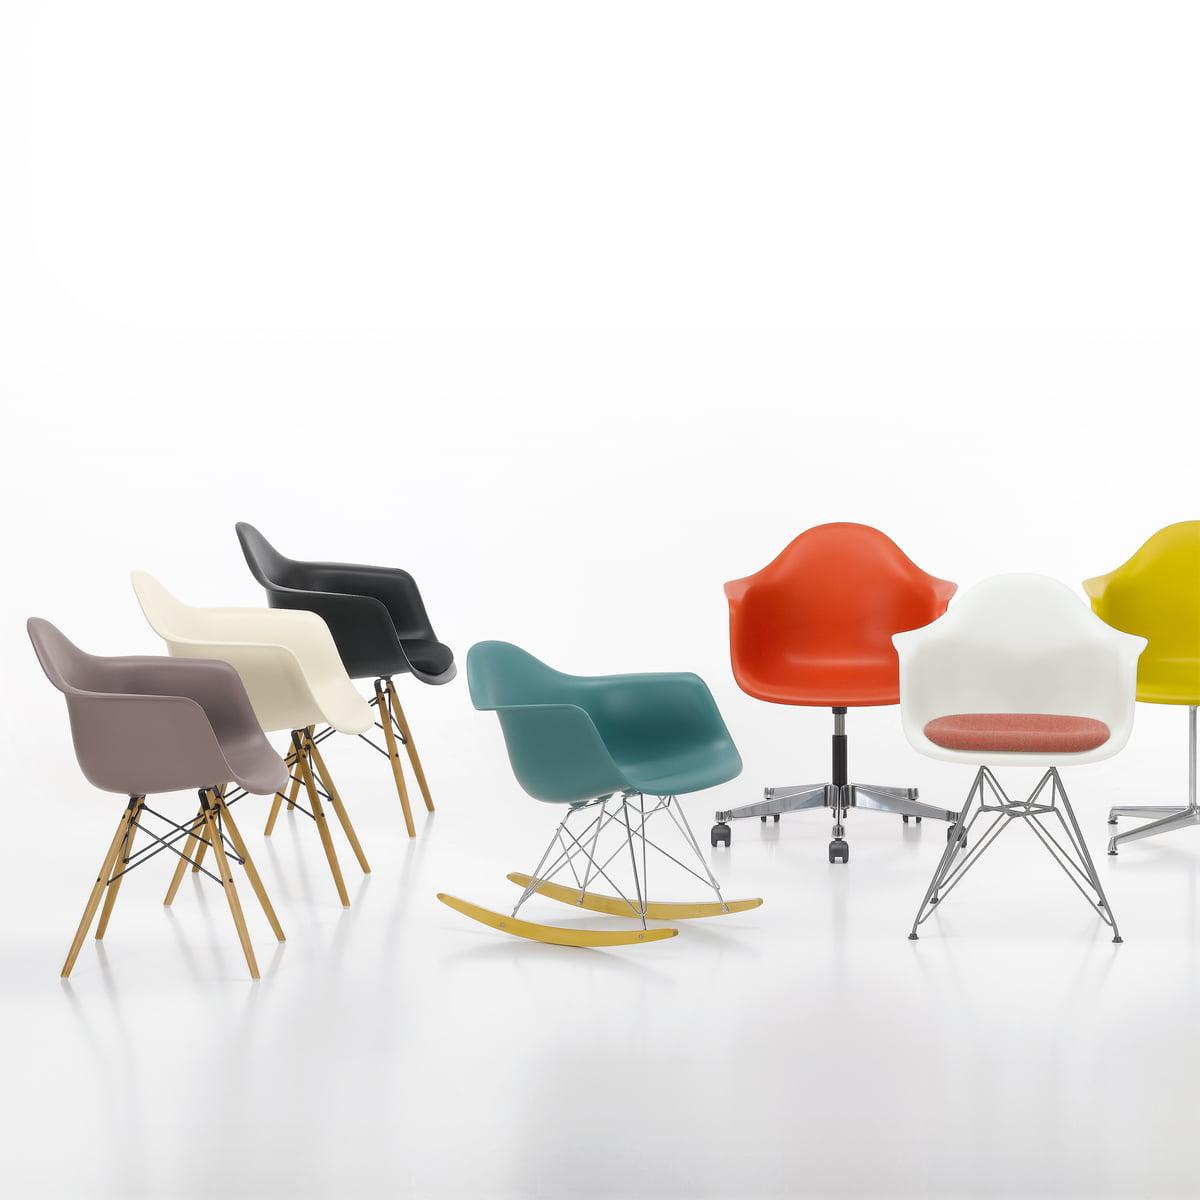 Eames Granitgraufilzgleiter Basic Plastic Chair Dark DsxVerchromt Vitra Side jLqVGUpSzM